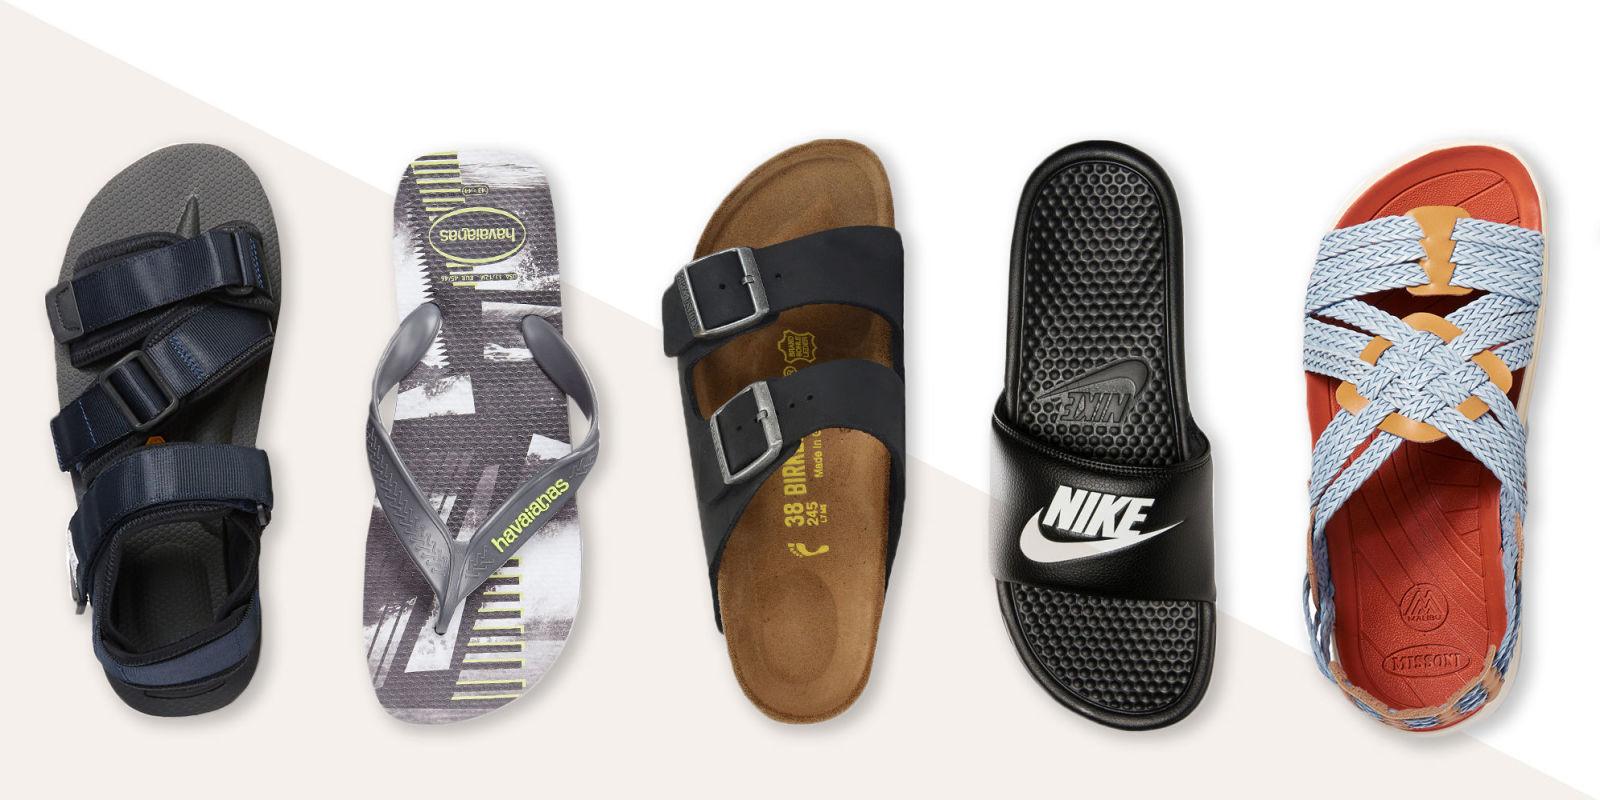 10 Best Men's Sandals for Summer 2017 - Stylish Flip Flops ...